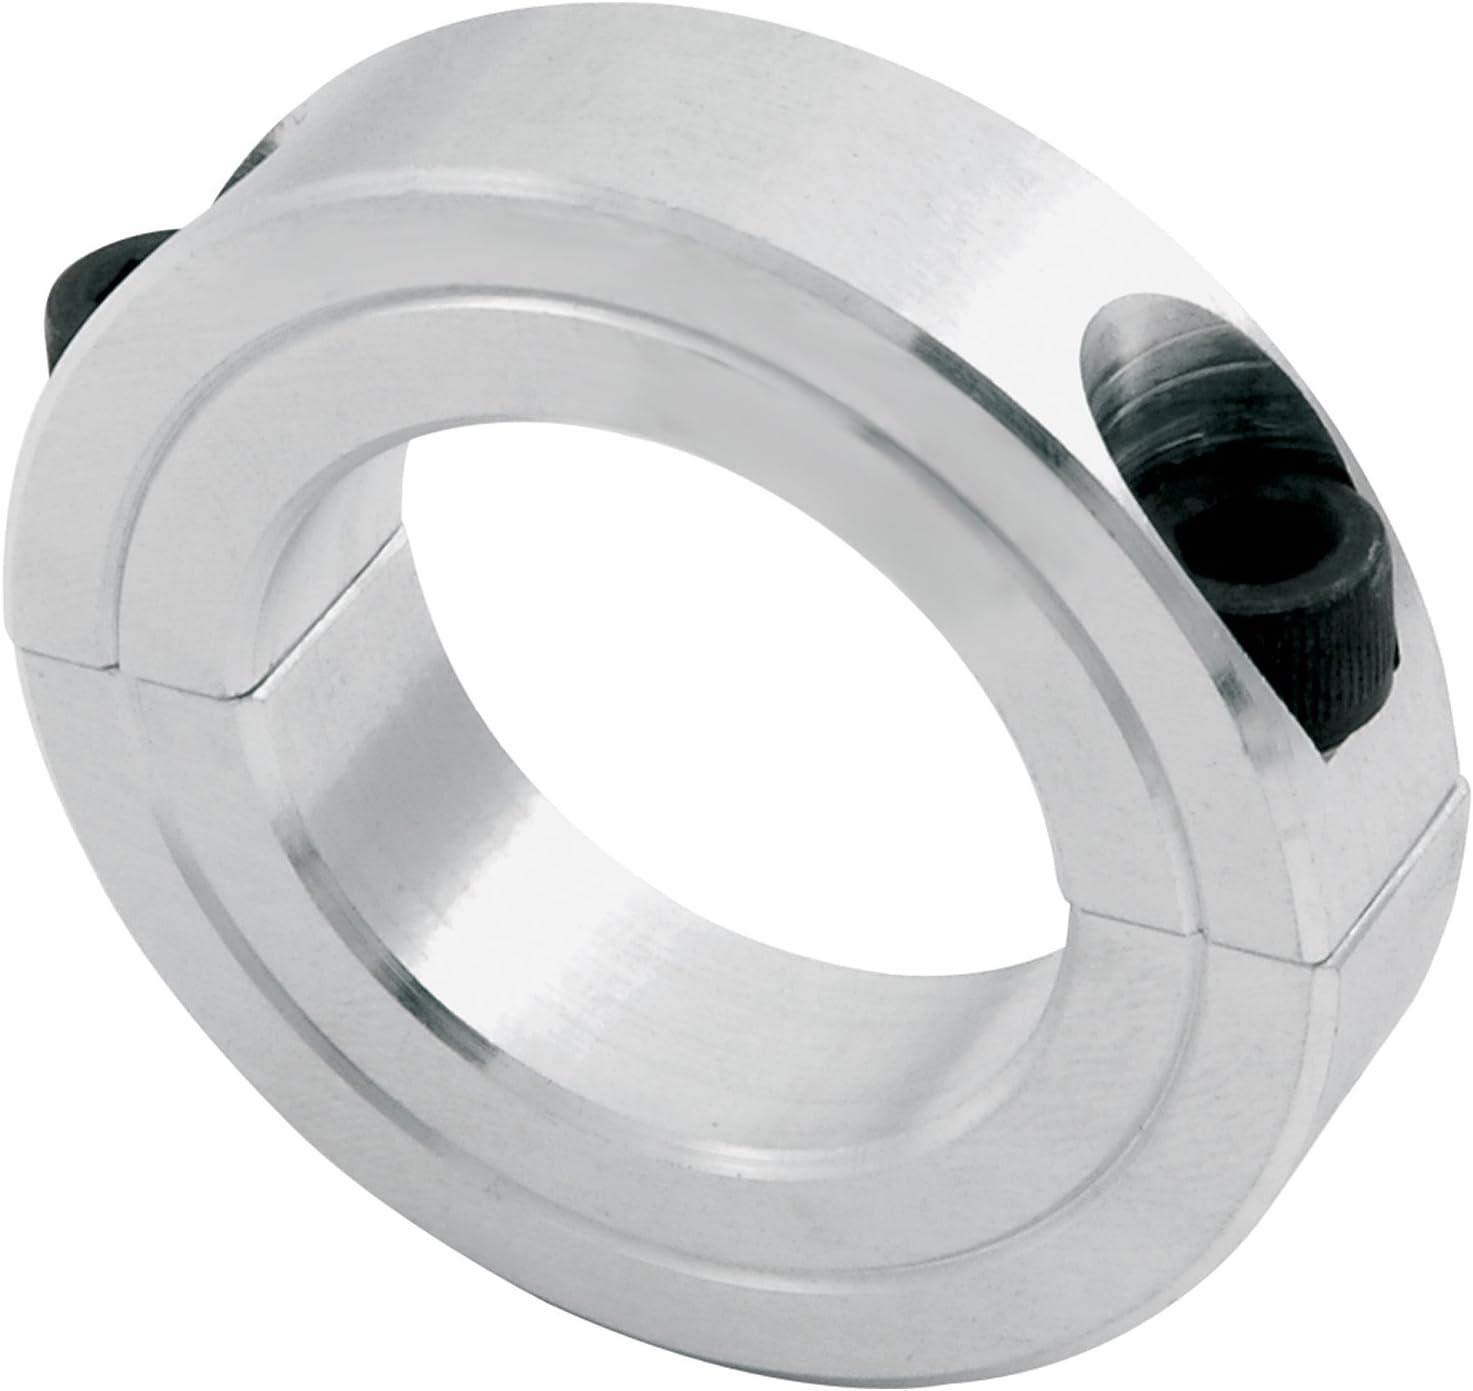 Allstar ALL52144 1 Aluminum 2-Piece Design Shaft Collar